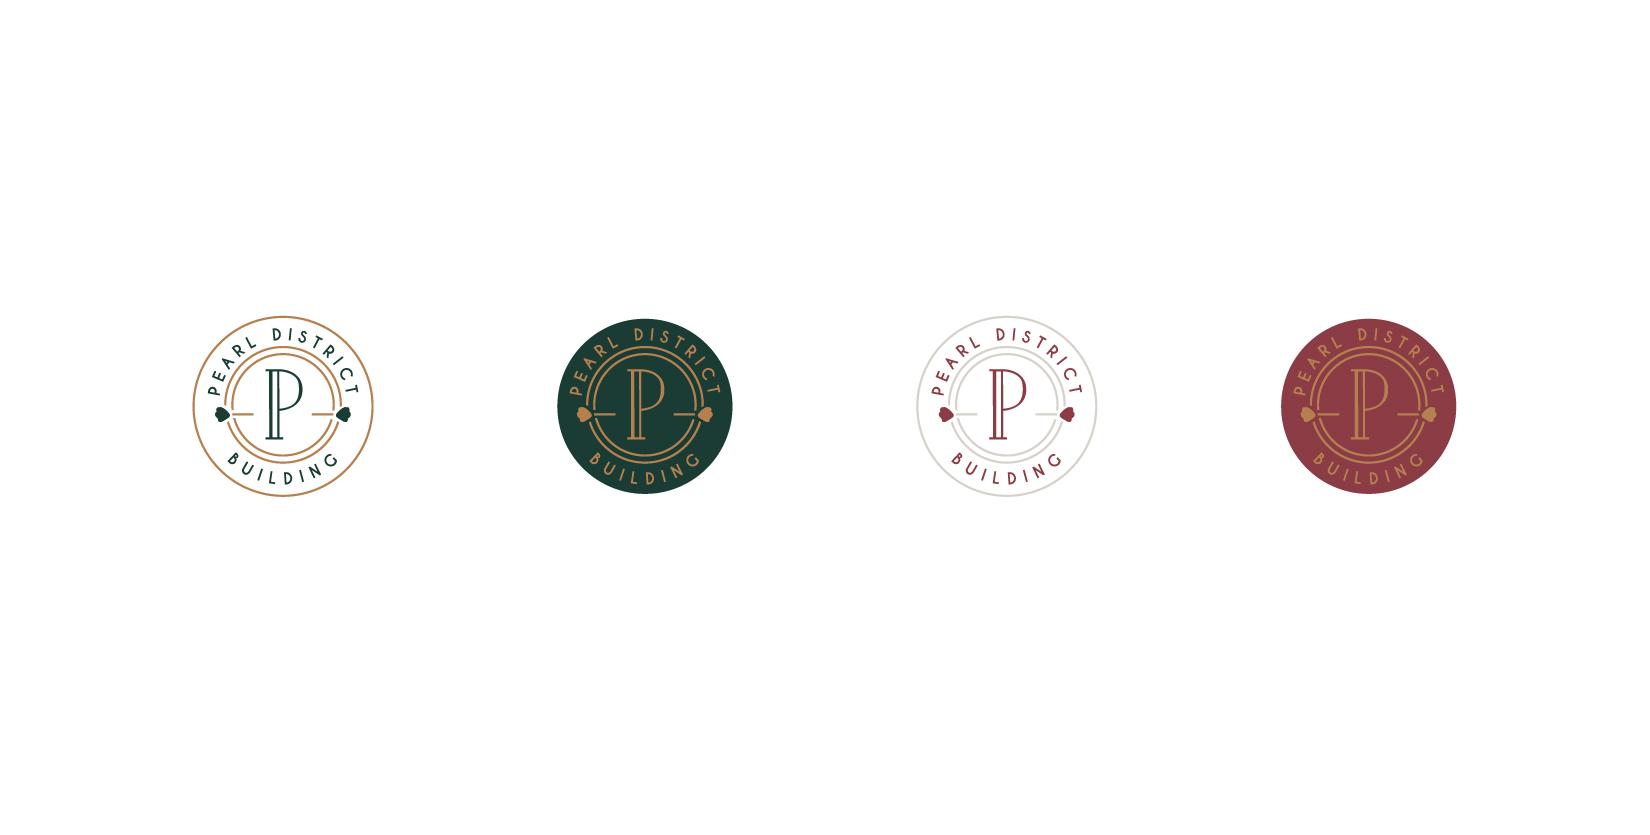 Pearl District Building – speakeasy eclectic branding – Hayley Bigham Designs – Tulsa Oklahoma Branding Studio – moody timeless antique